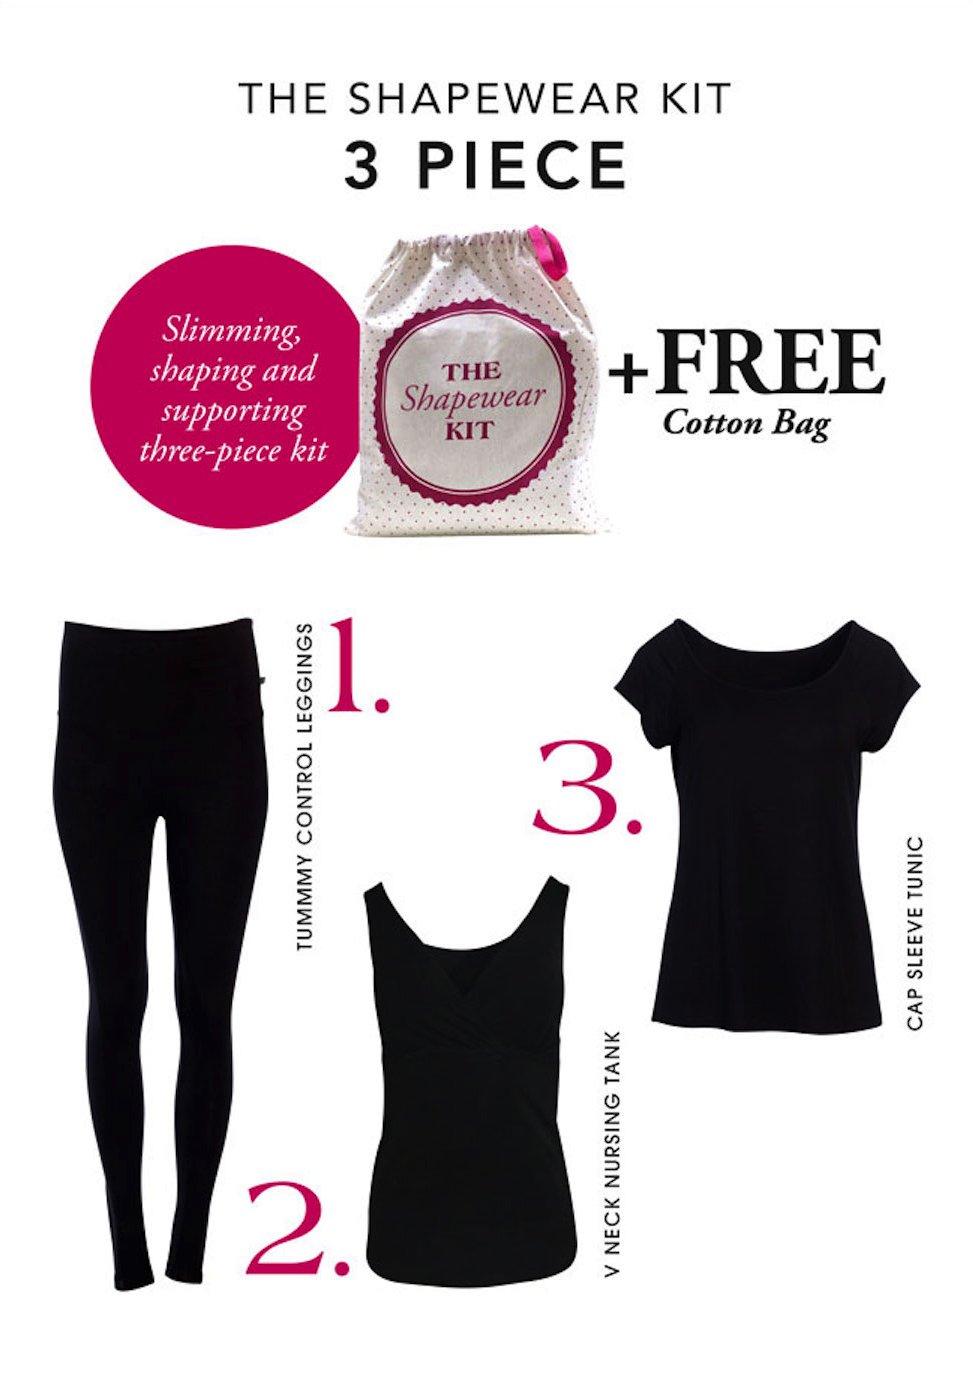 Angel Maternity Shapewear Kit: 3-piece Shapewear for woman kit + Helps achieve that postpartum flat stomach - M